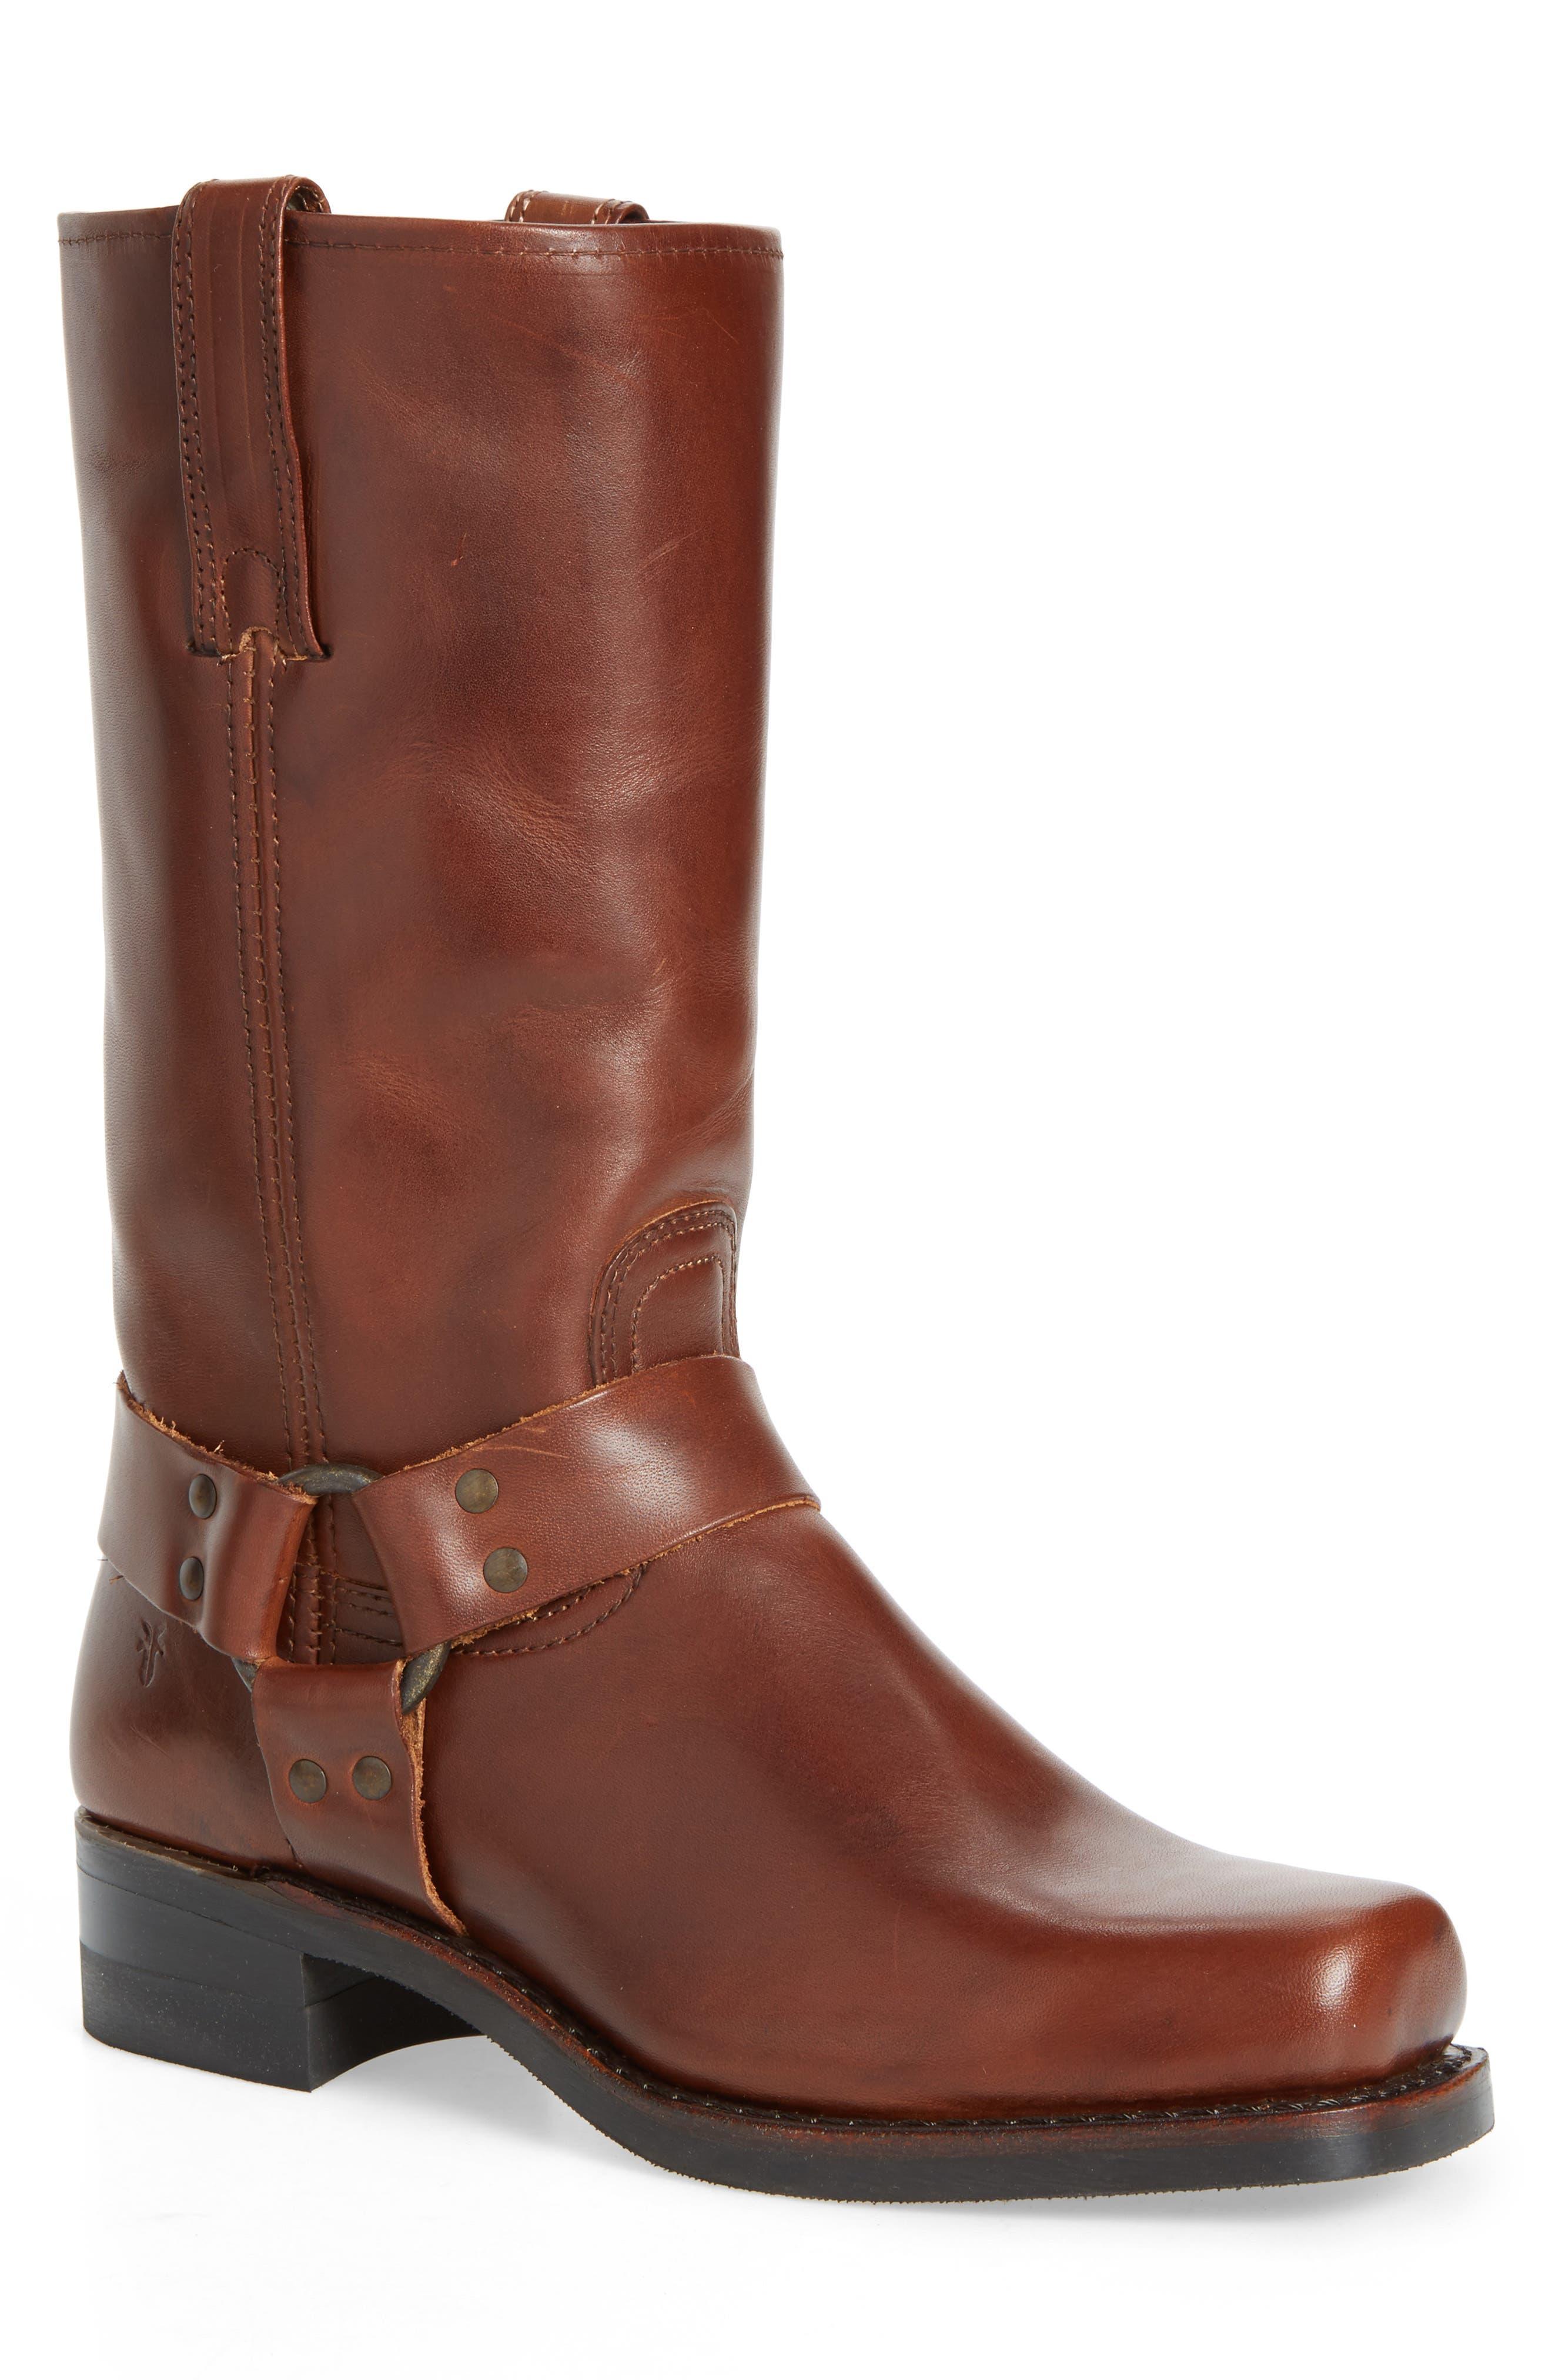 Frye 12R Harness Boot, Brown